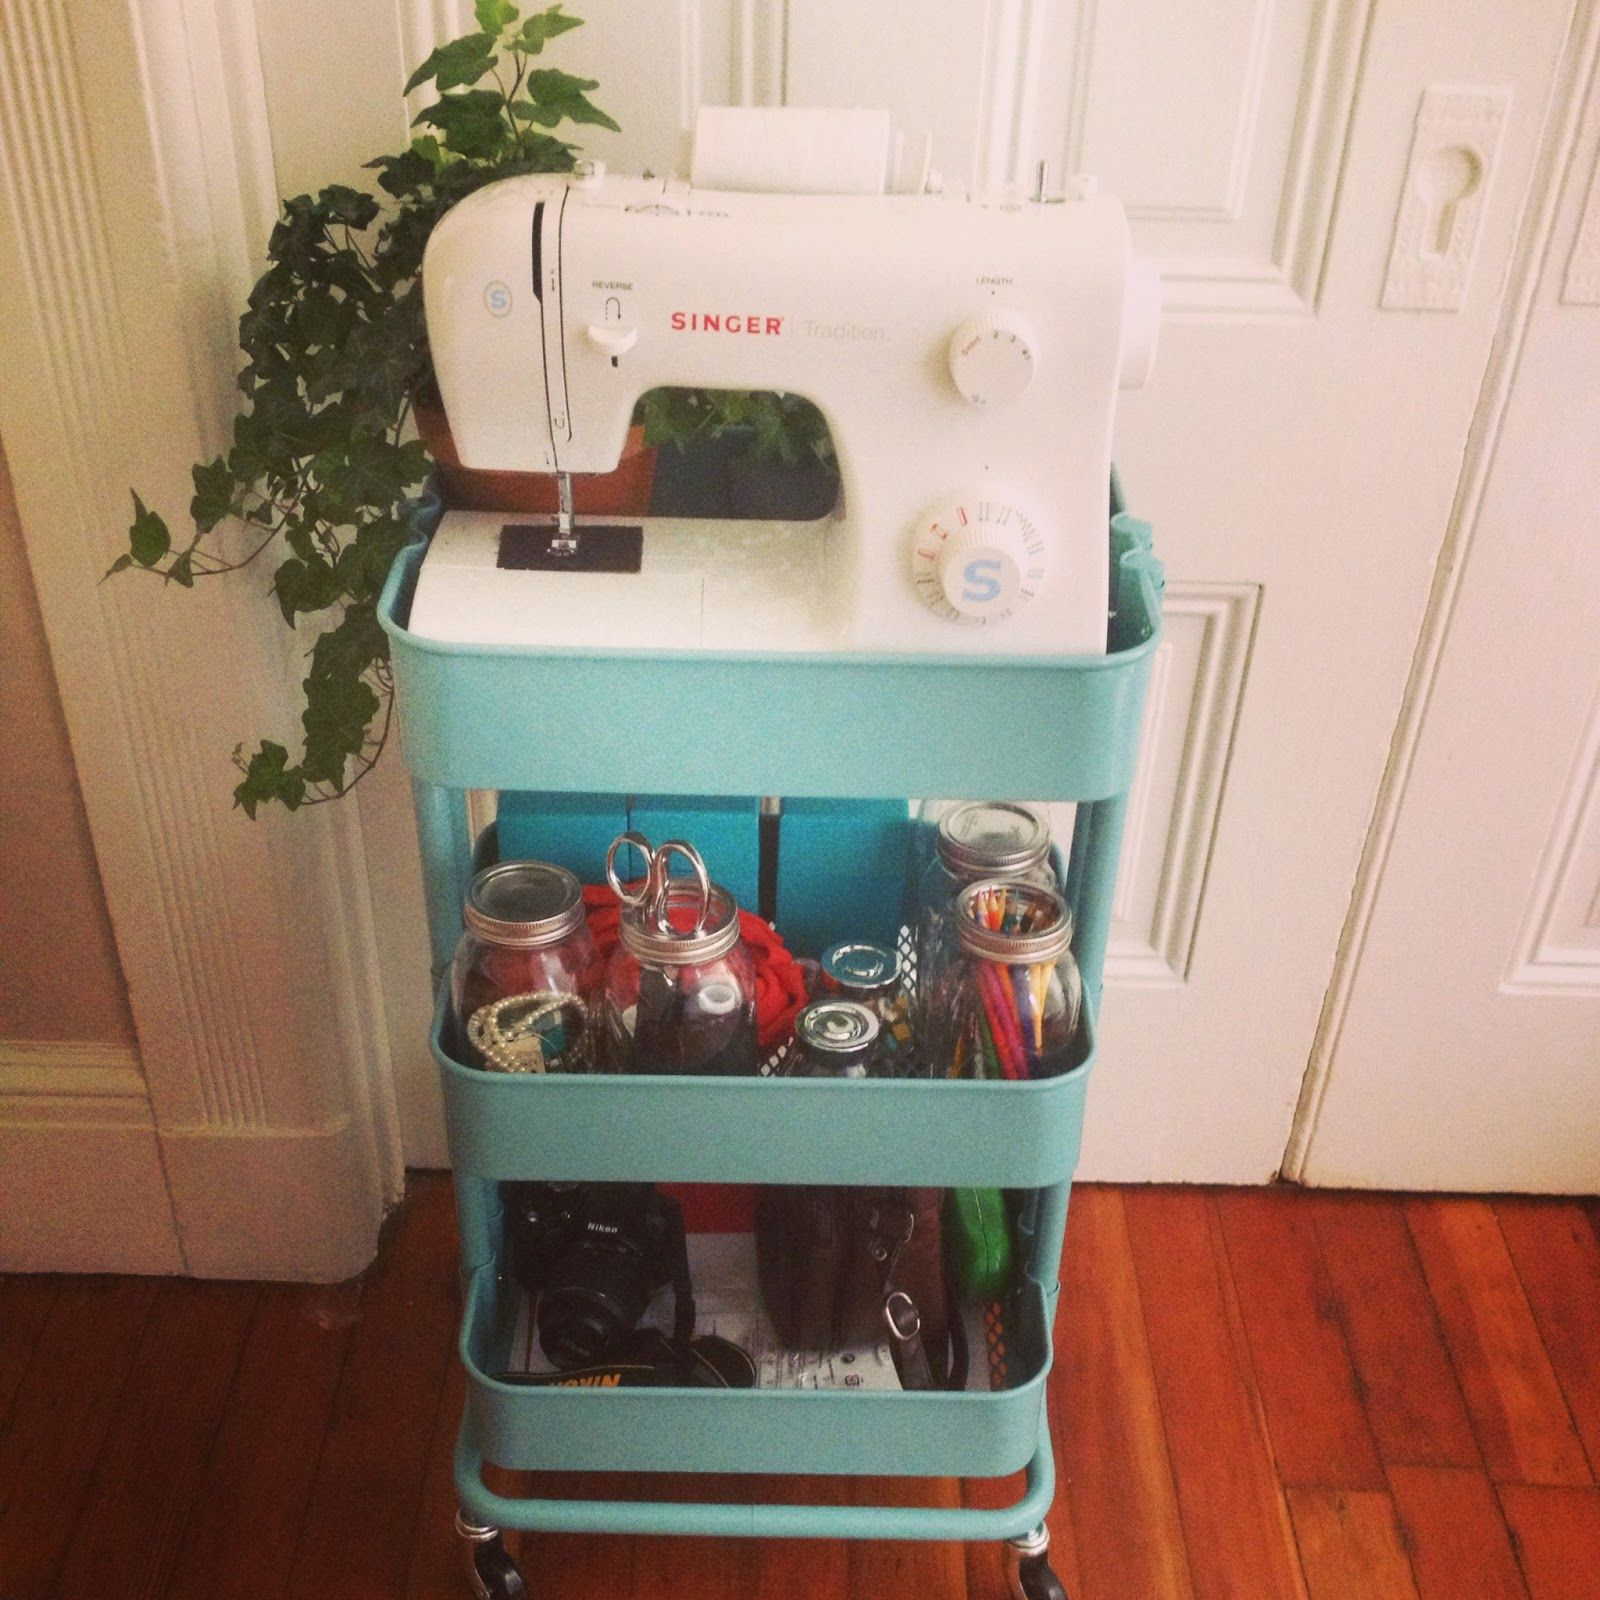 Pin by Hannah Tenpas on Office digs | Pinterest | Ikea kitchen cart ...